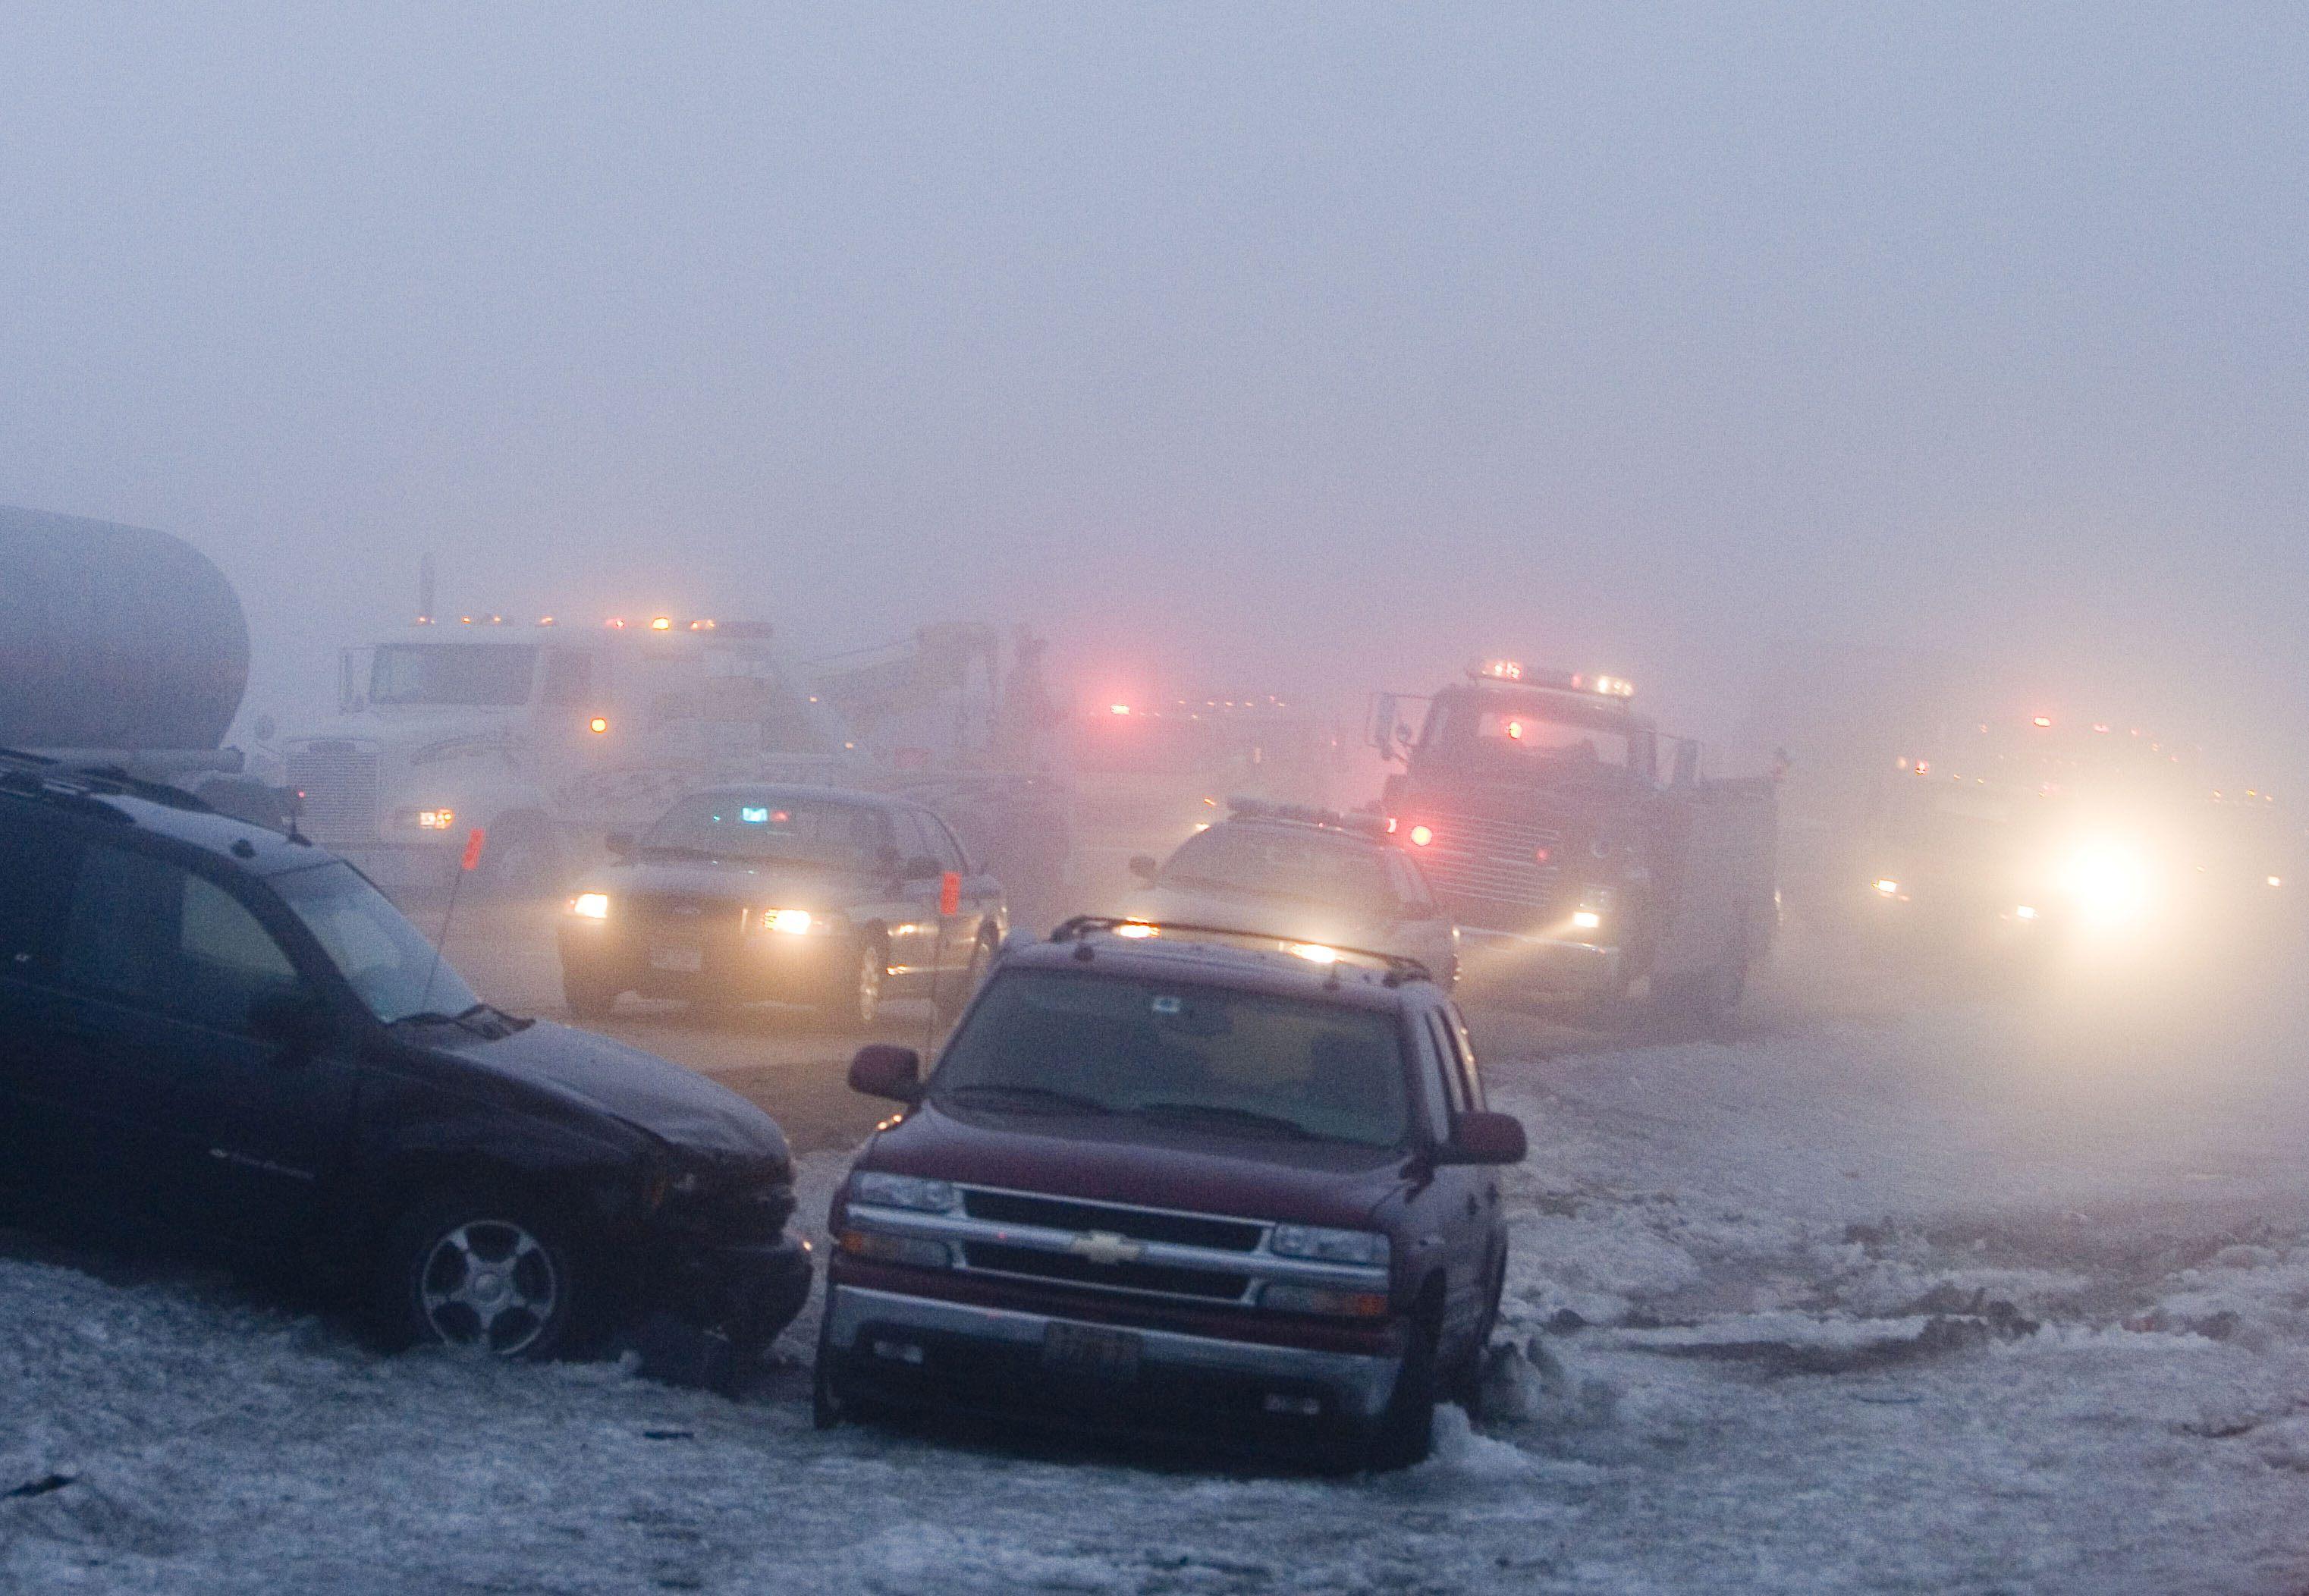 Emergency personnel make their way to multi-car pileup on Interstate 90 near Madison, Wis., Sunday, Jan. 6, 2008.